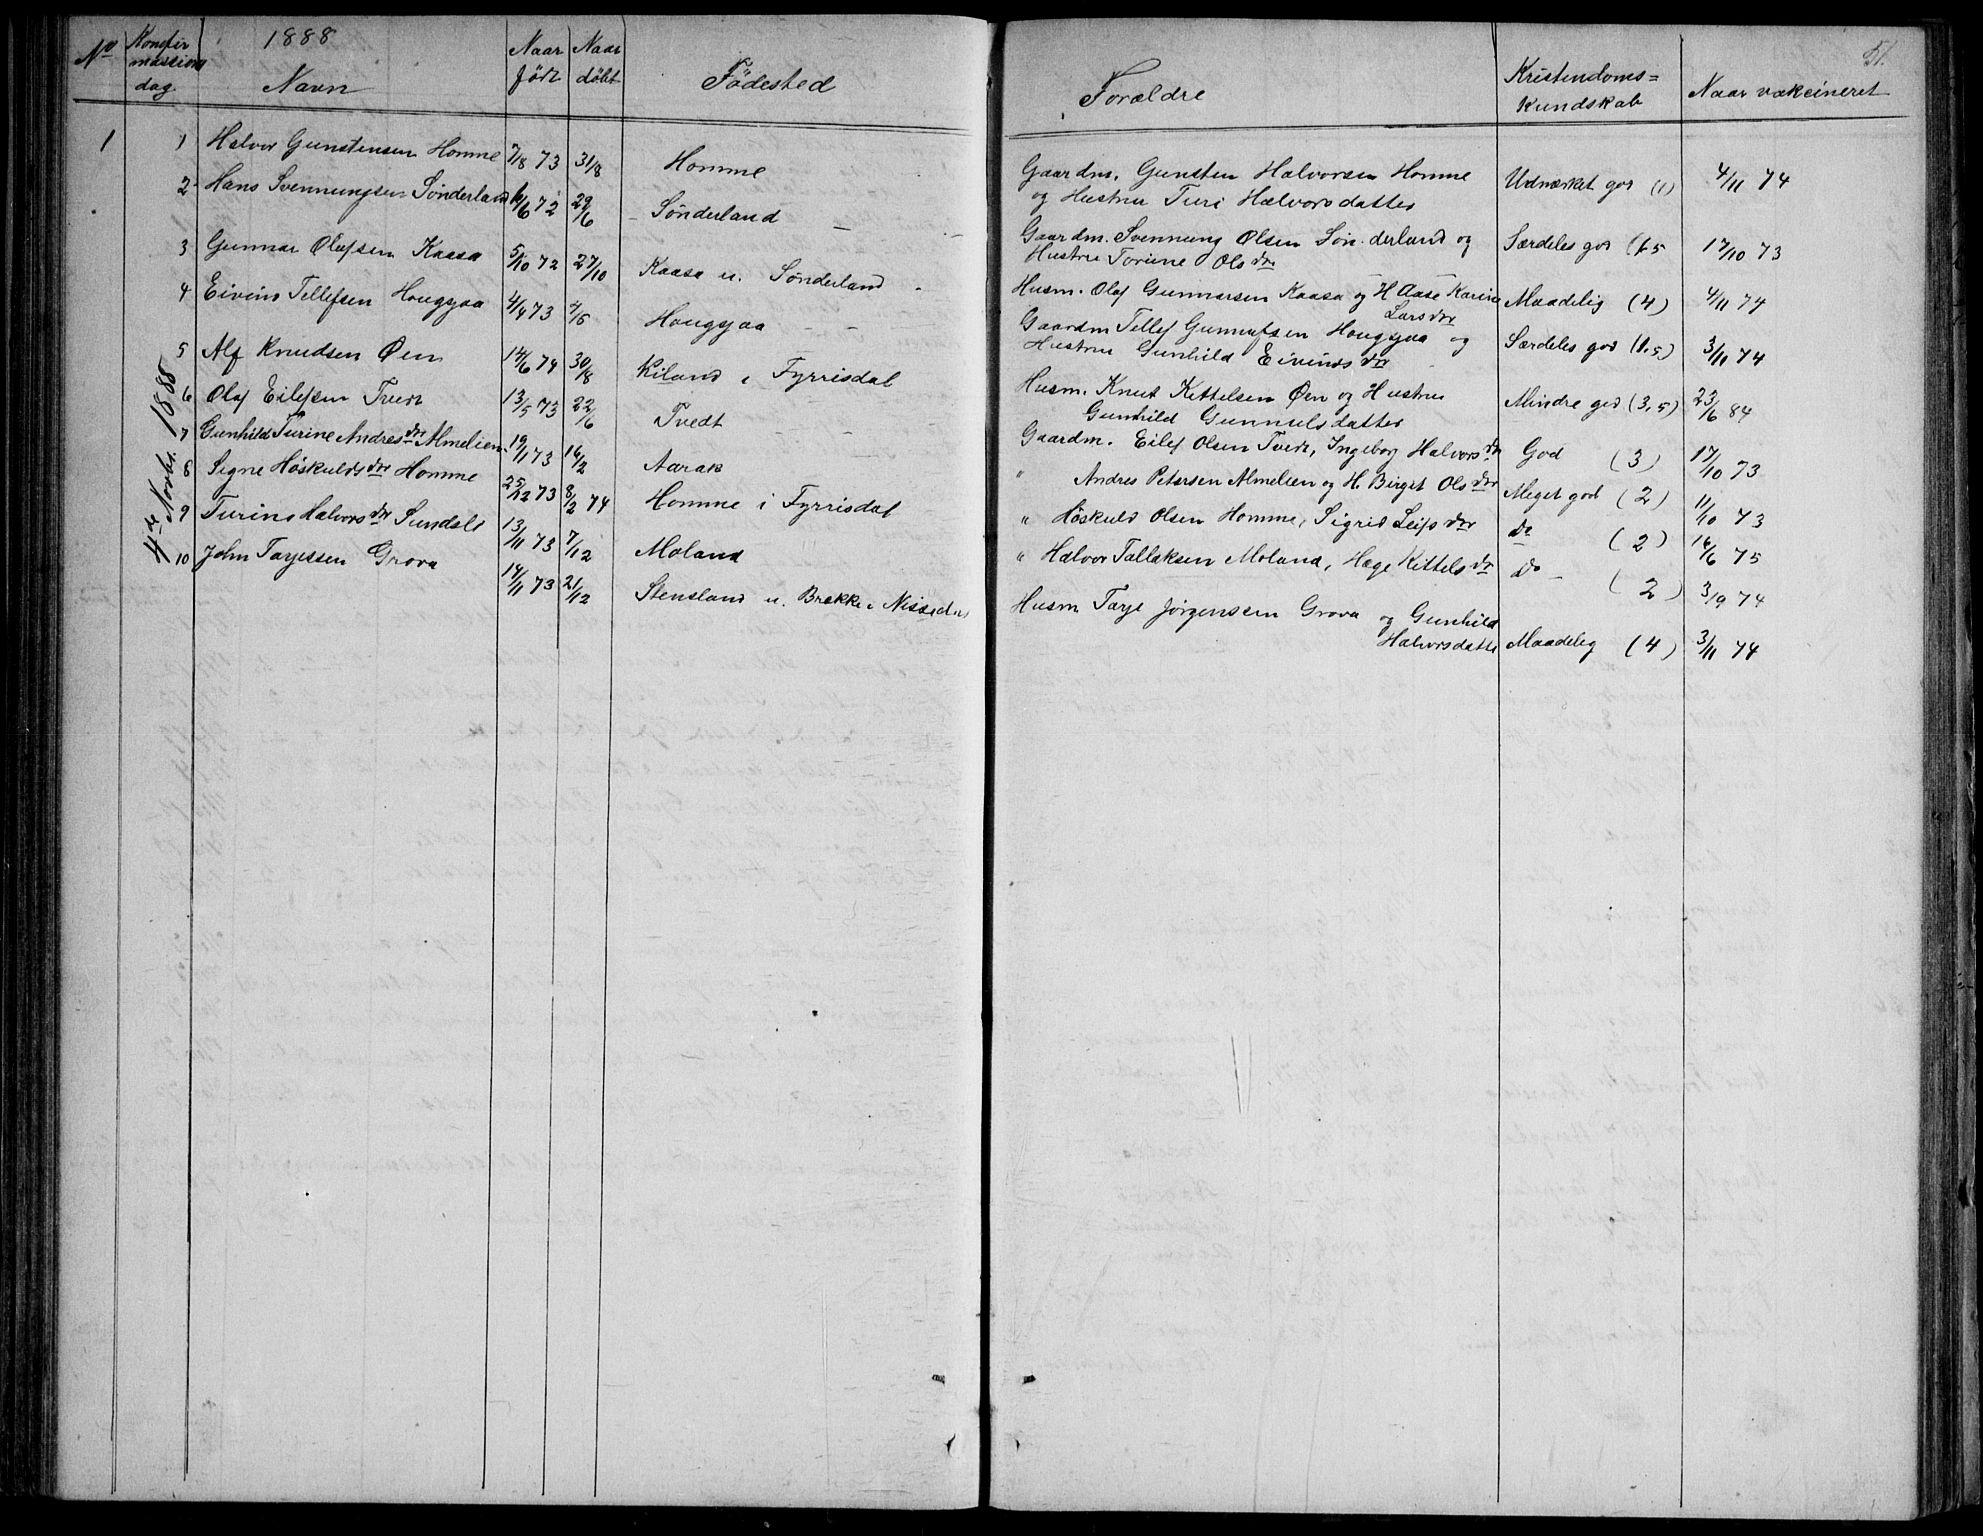 SAKO, Nissedal kirkebøker, G/Gb/L0002: Klokkerbok nr. II 2, 1863-1892, s. 51